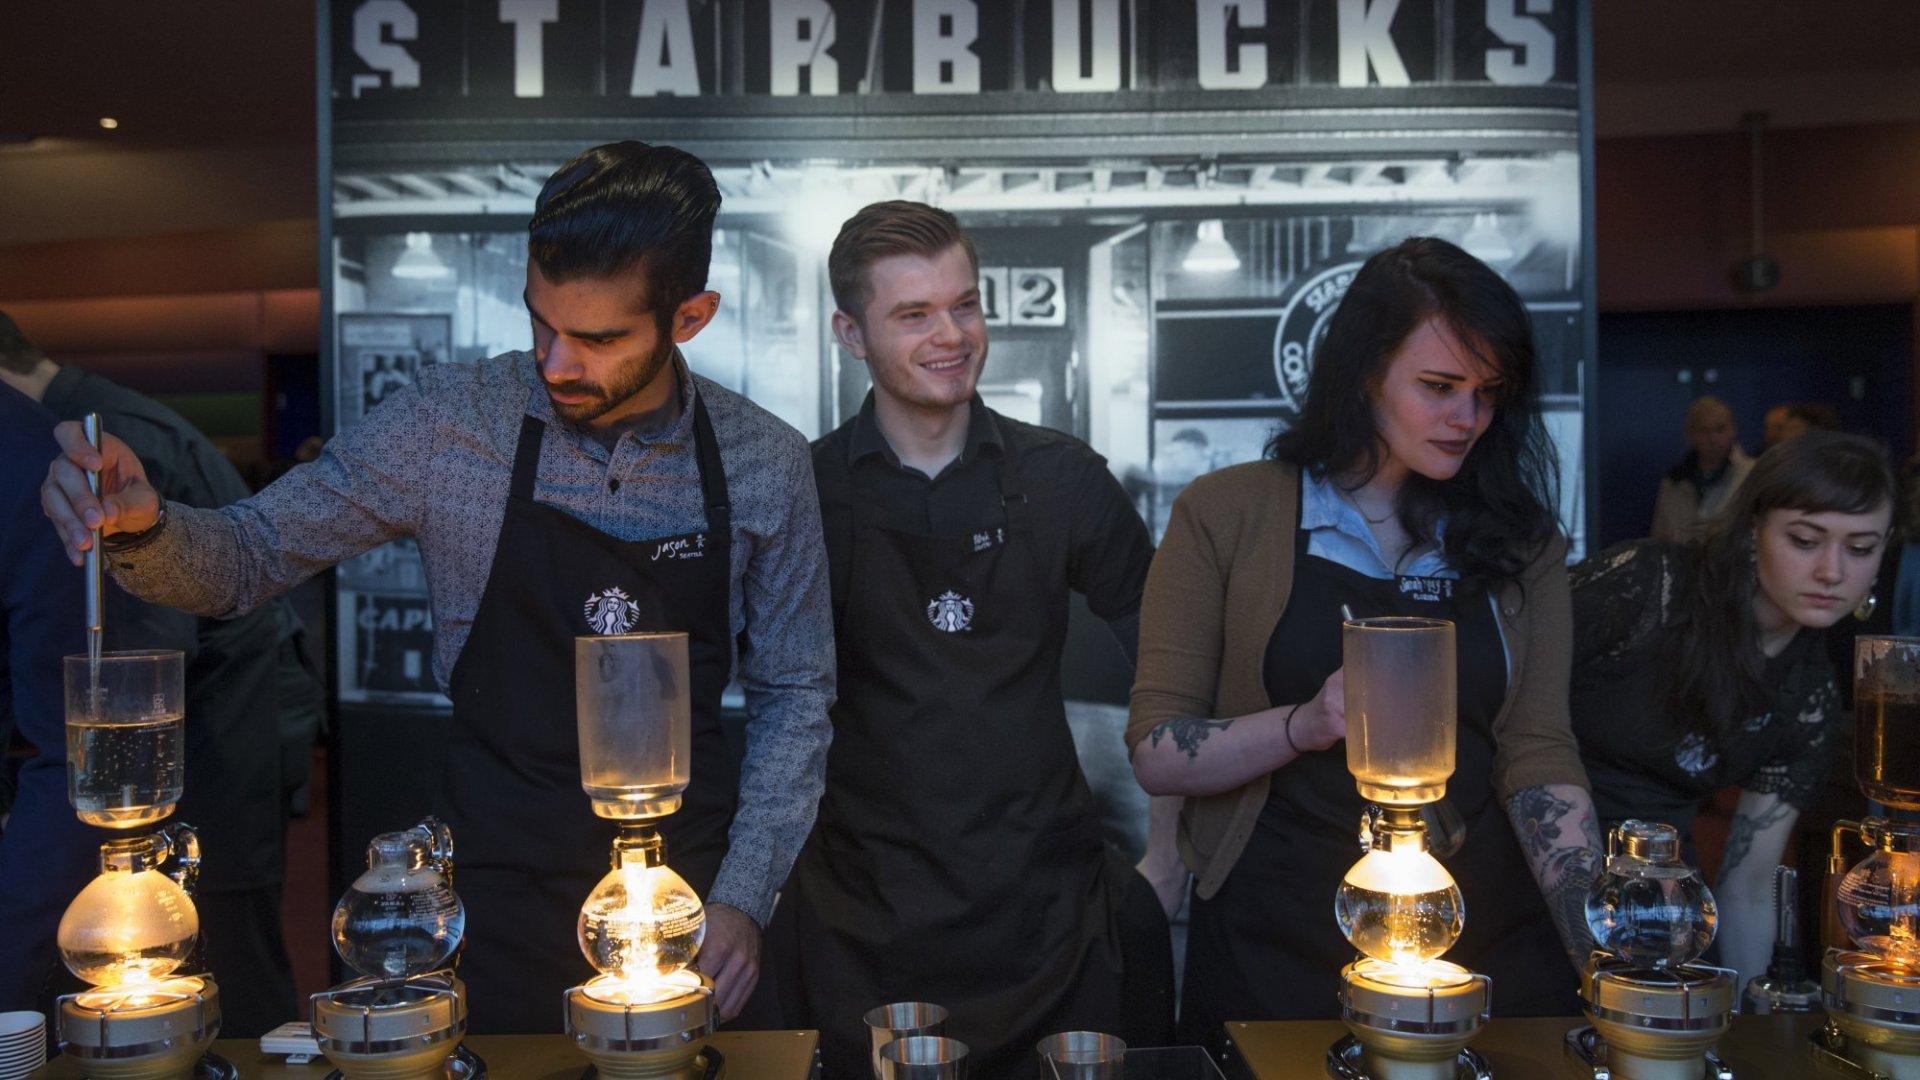 Workers at Starbucks and JP Morgan to Get Big Raises